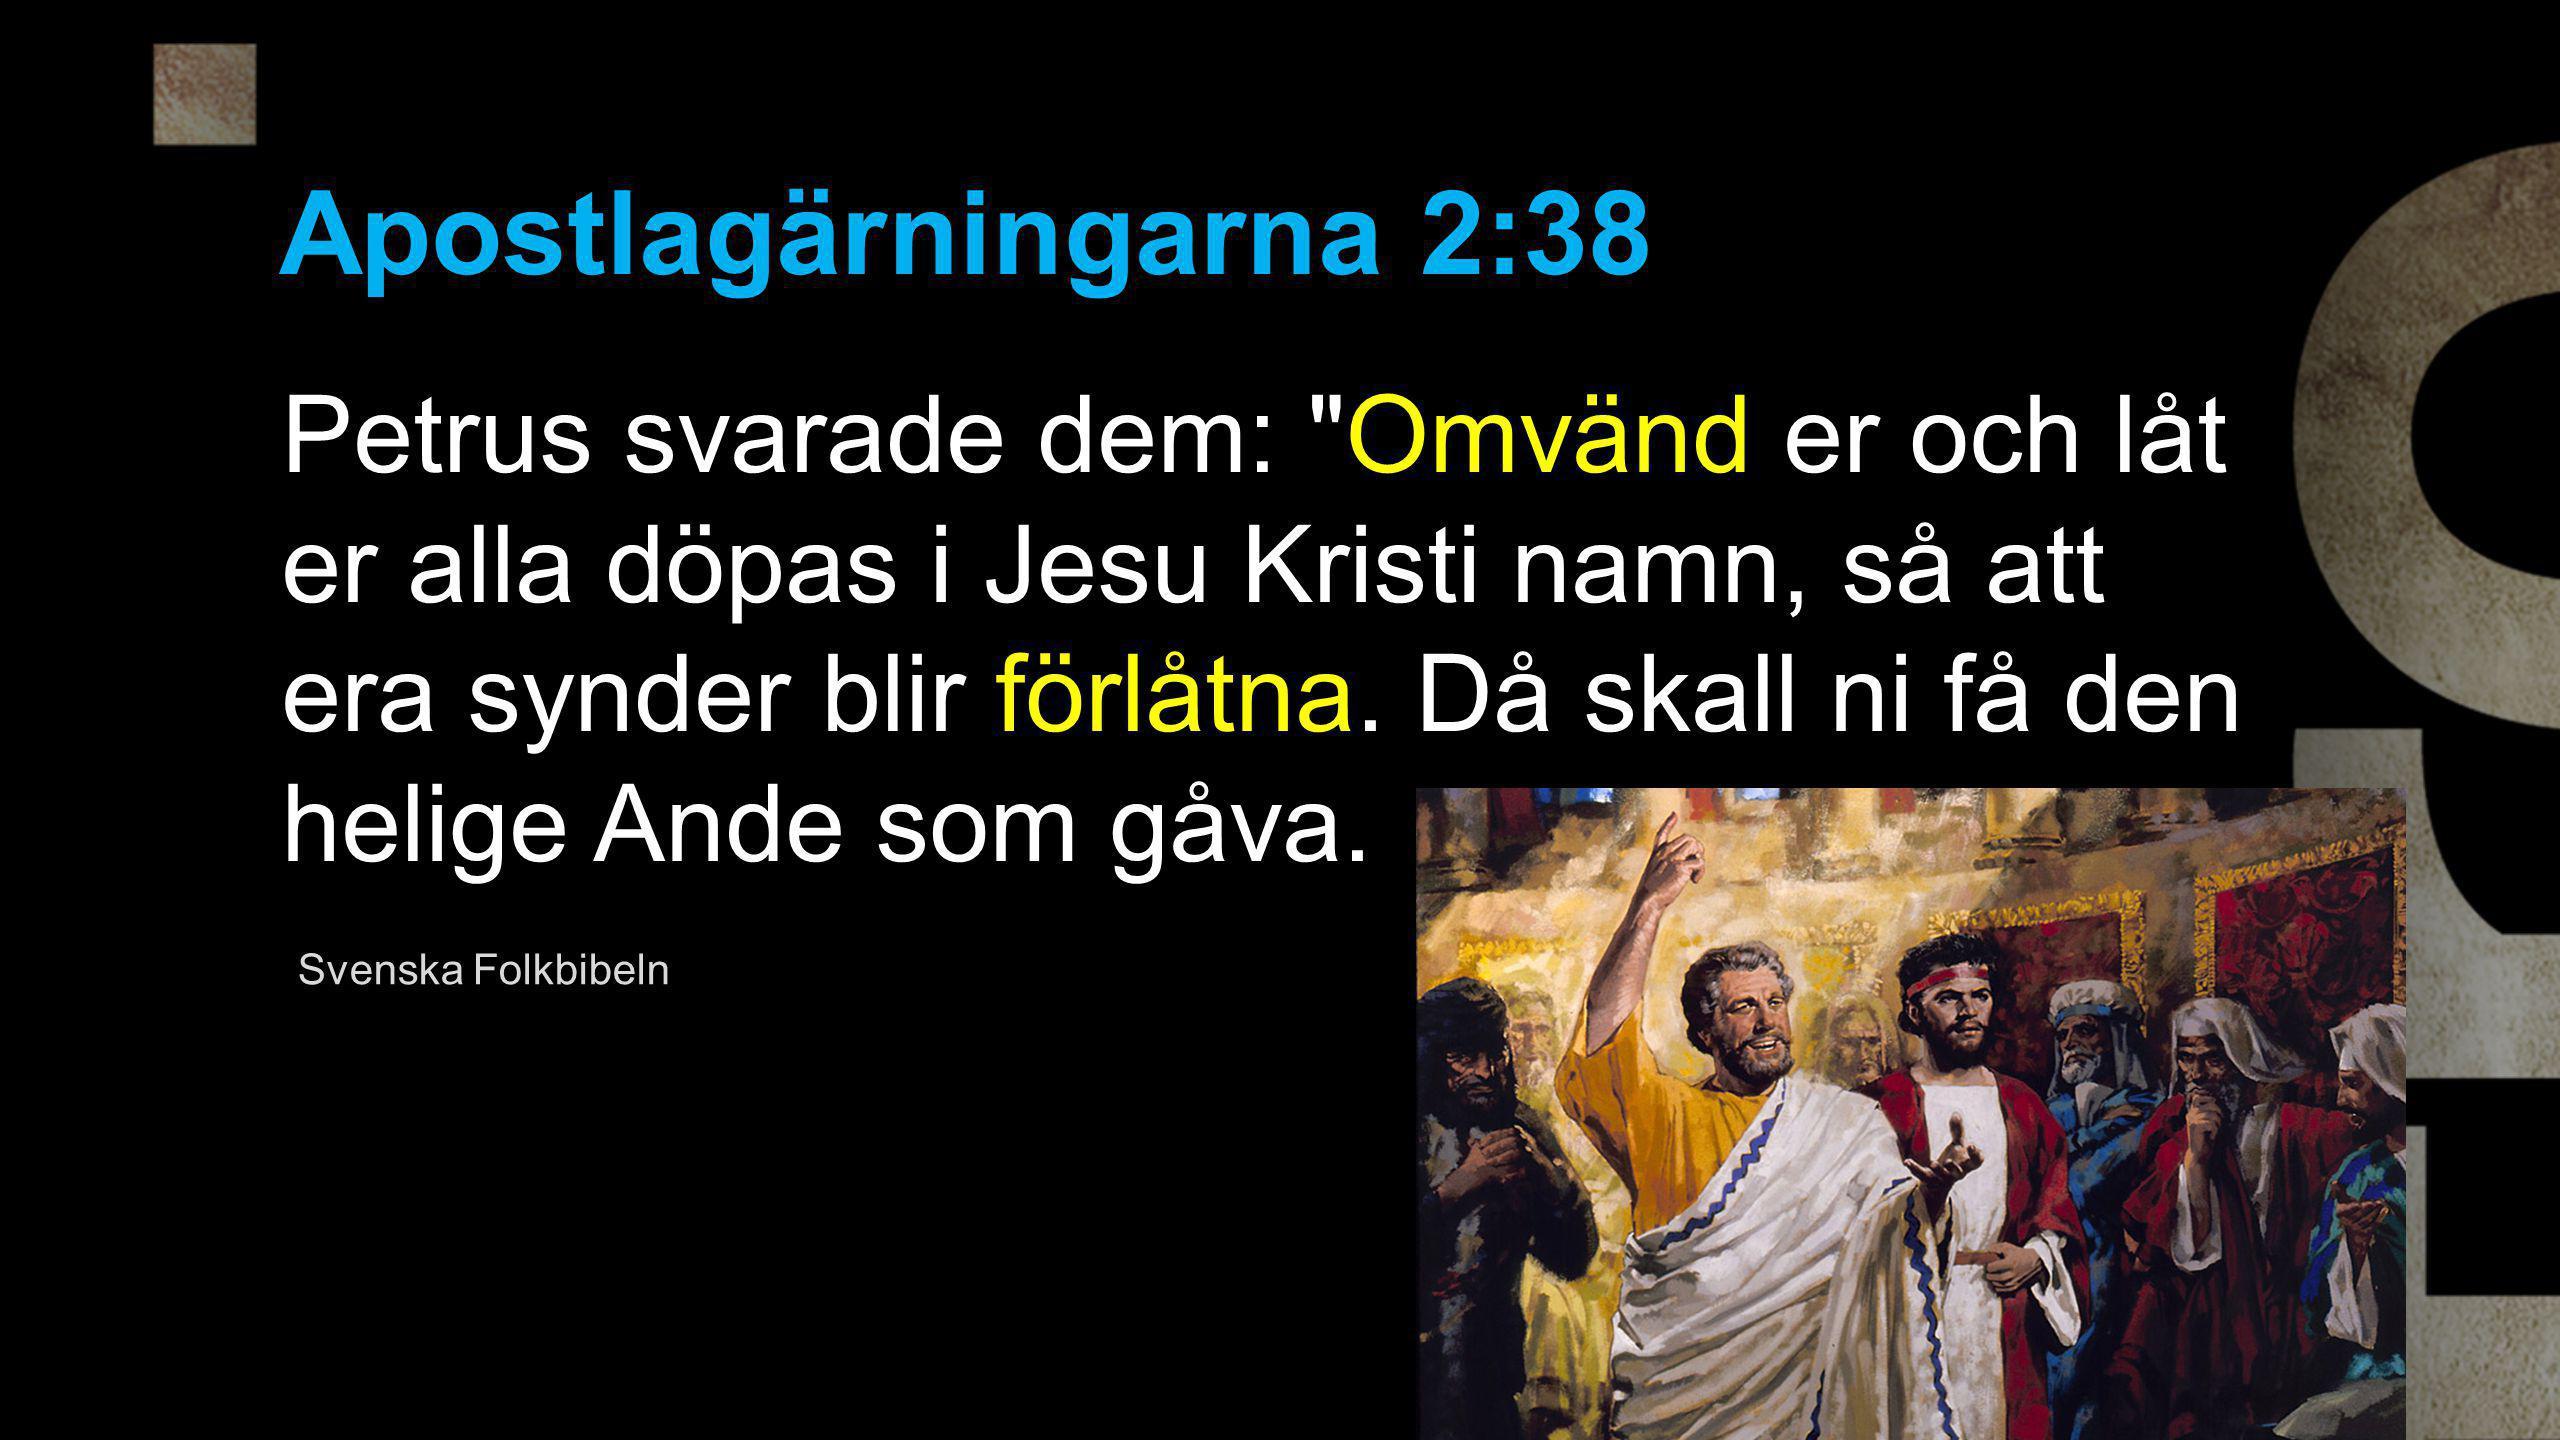 Apostlagärningarna 2:38 Petrus svarade dem: